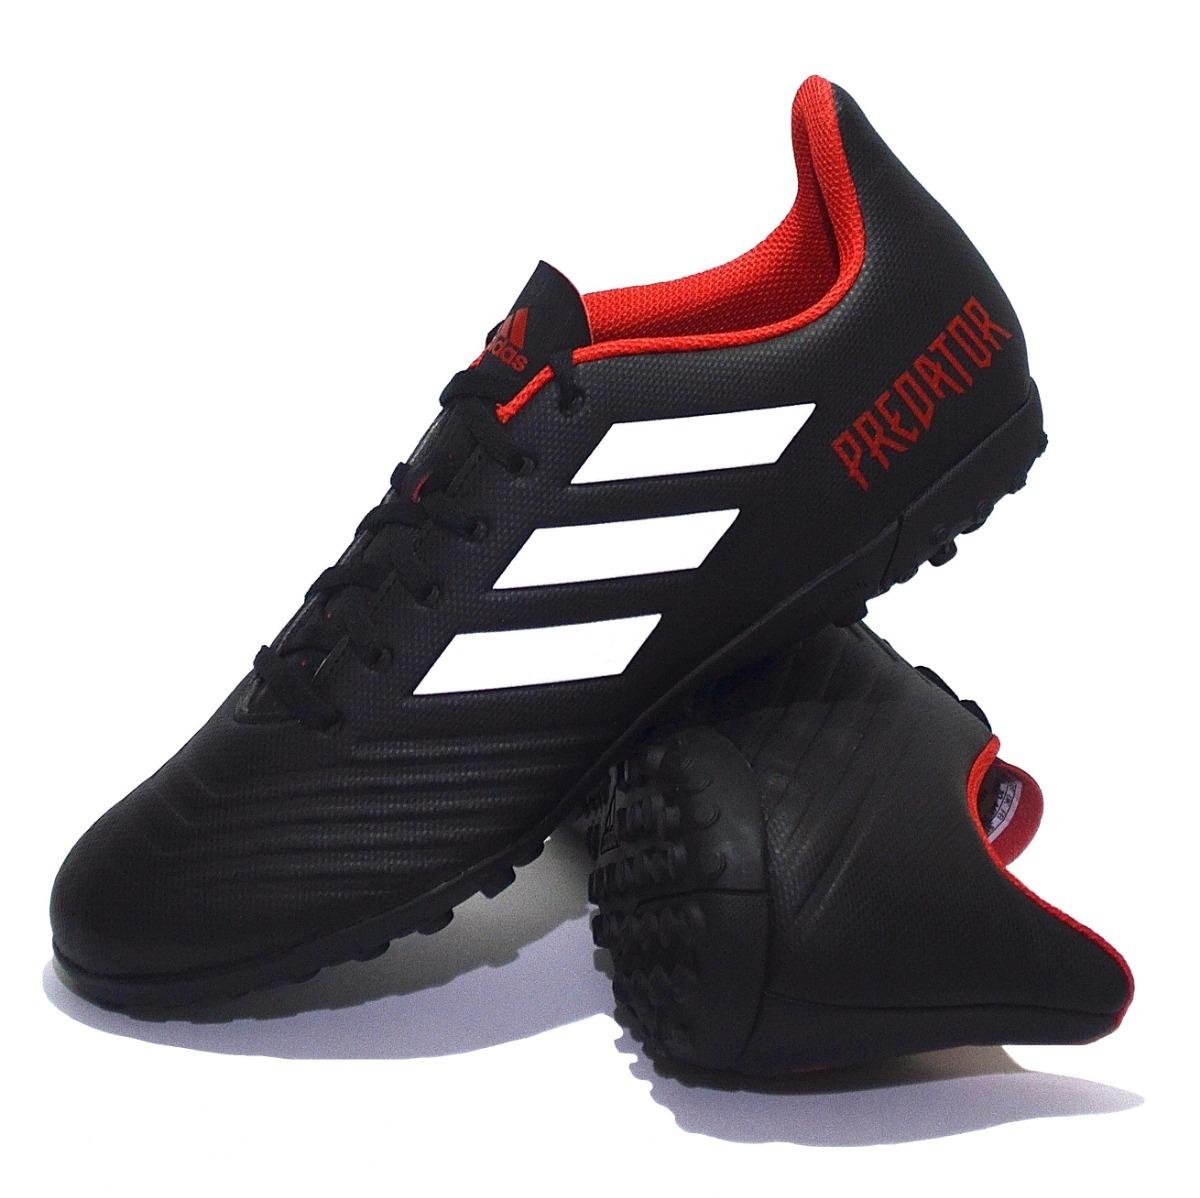 20a968f6d6057 Botines adidas Modelo Predator Tango 18.4 T F -- 10 % O F F ...